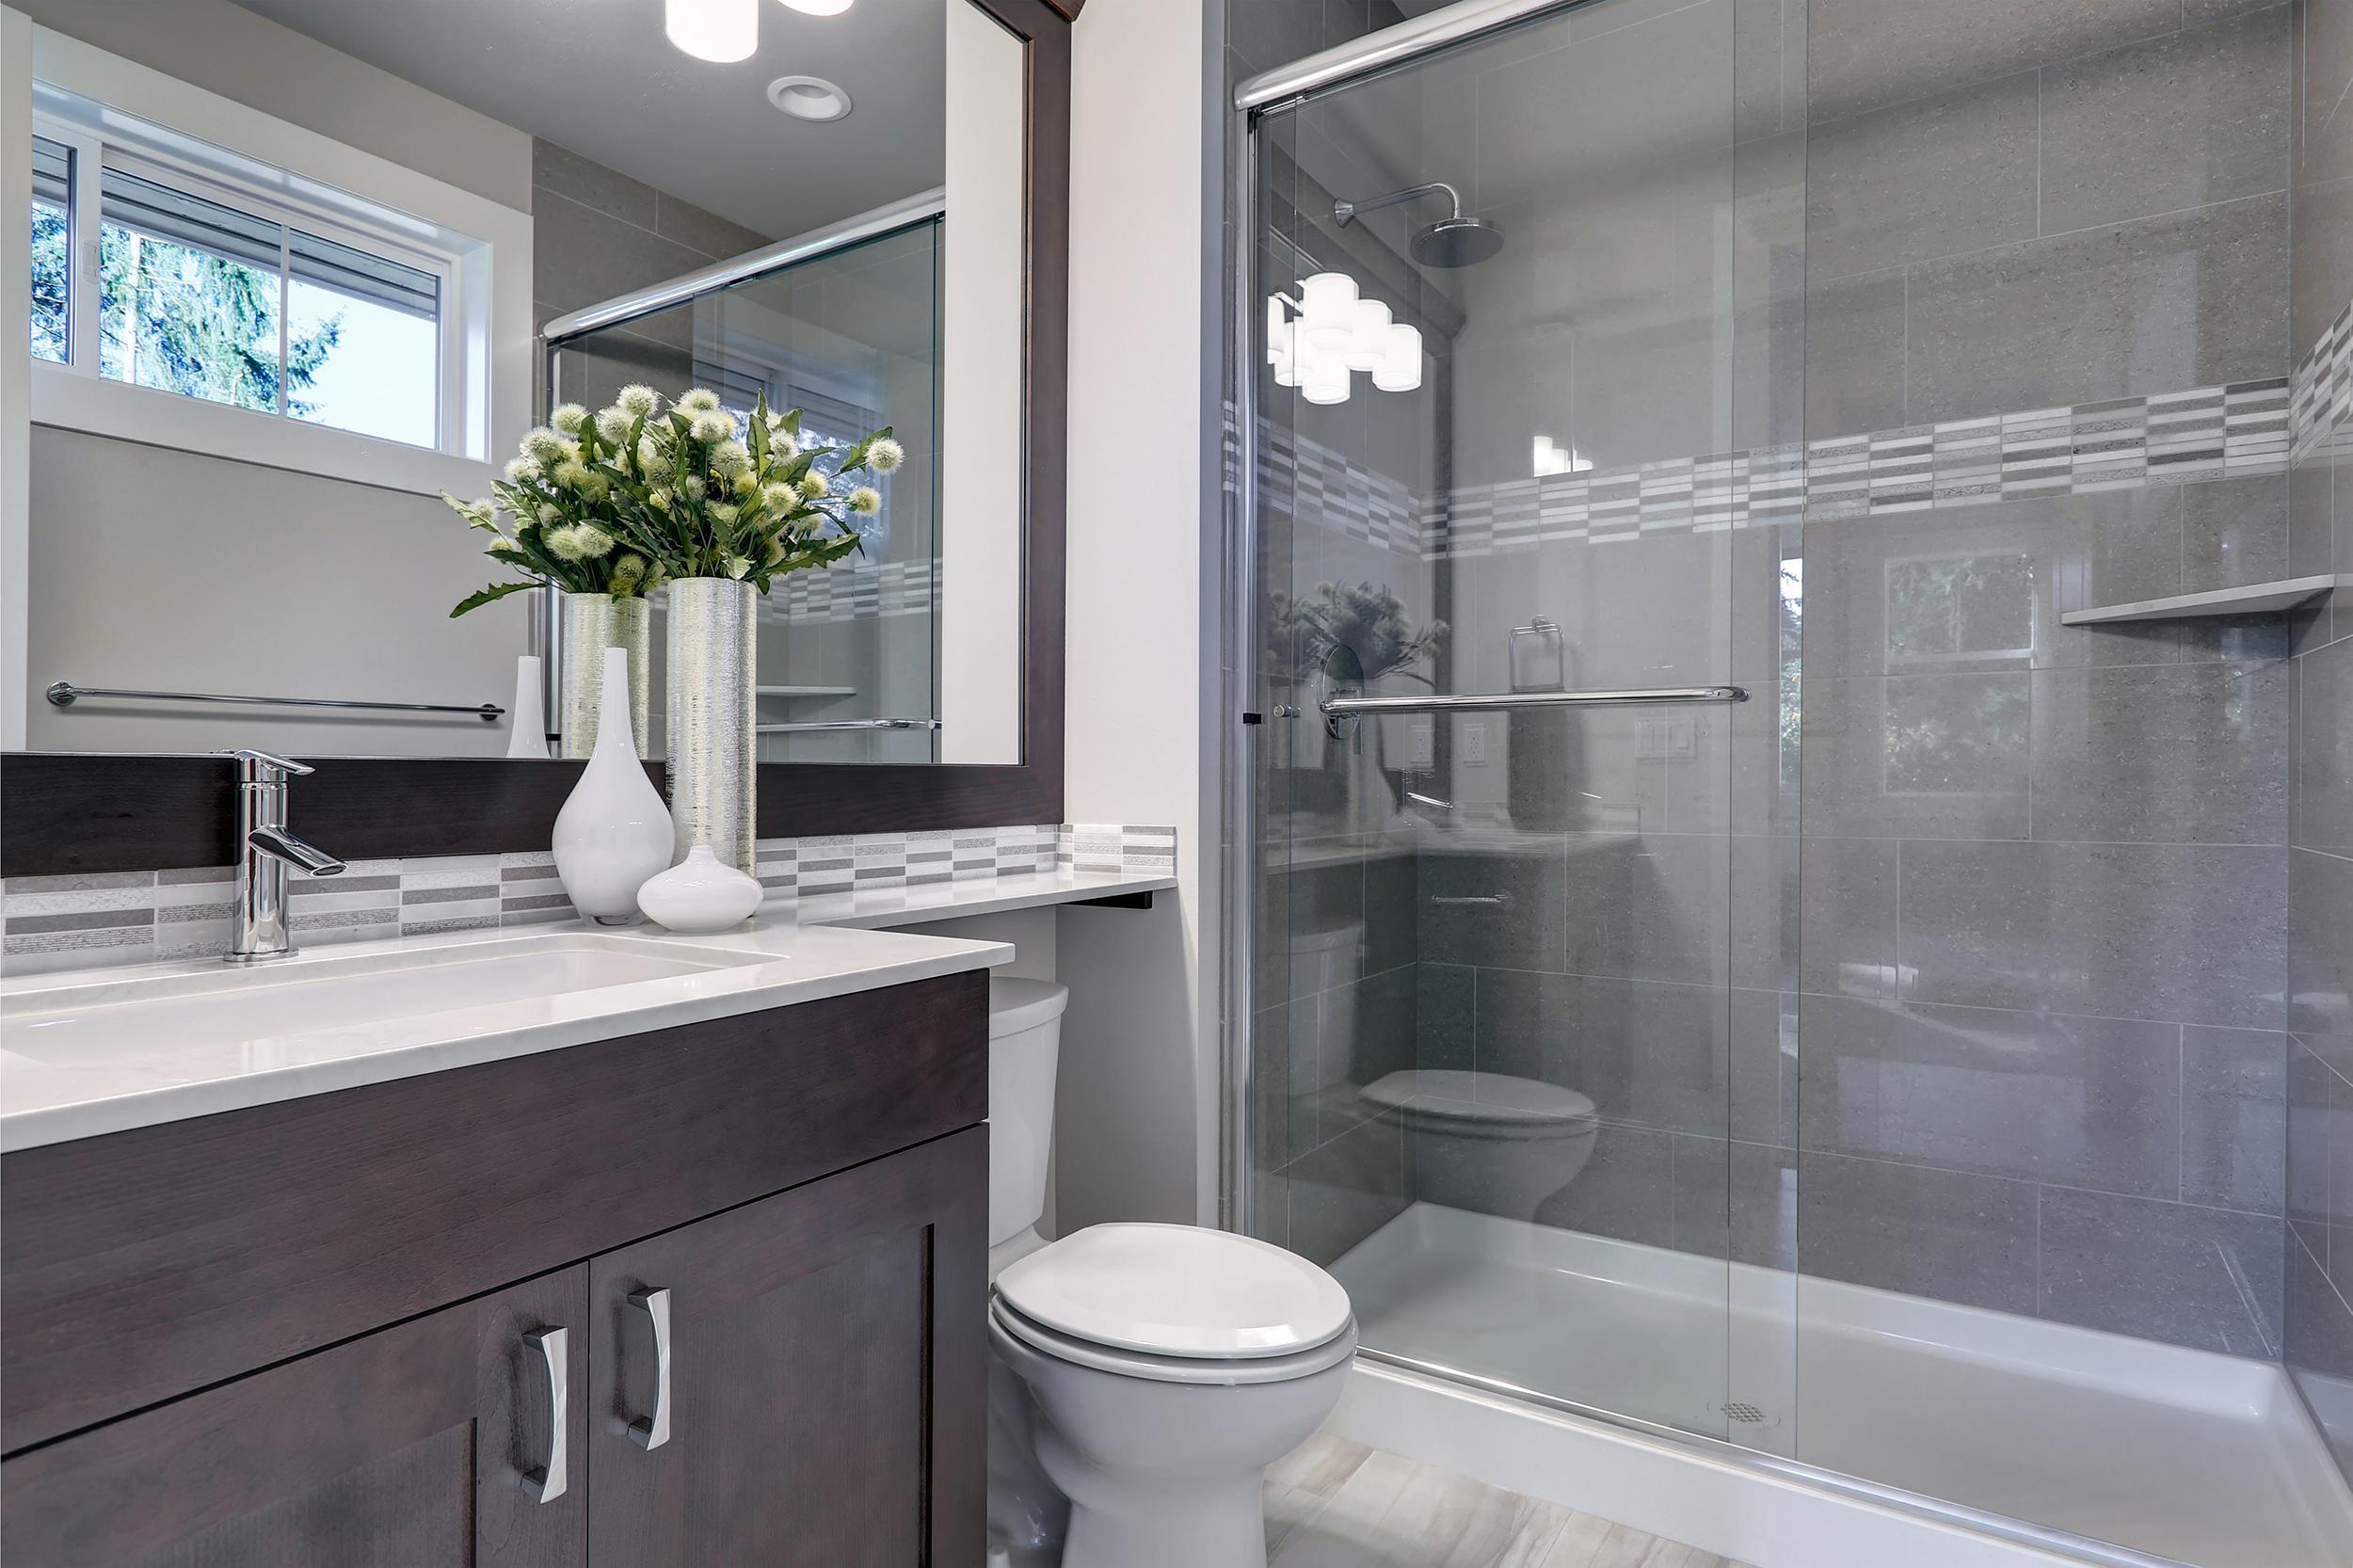 A photo of a contemporary bathroom.